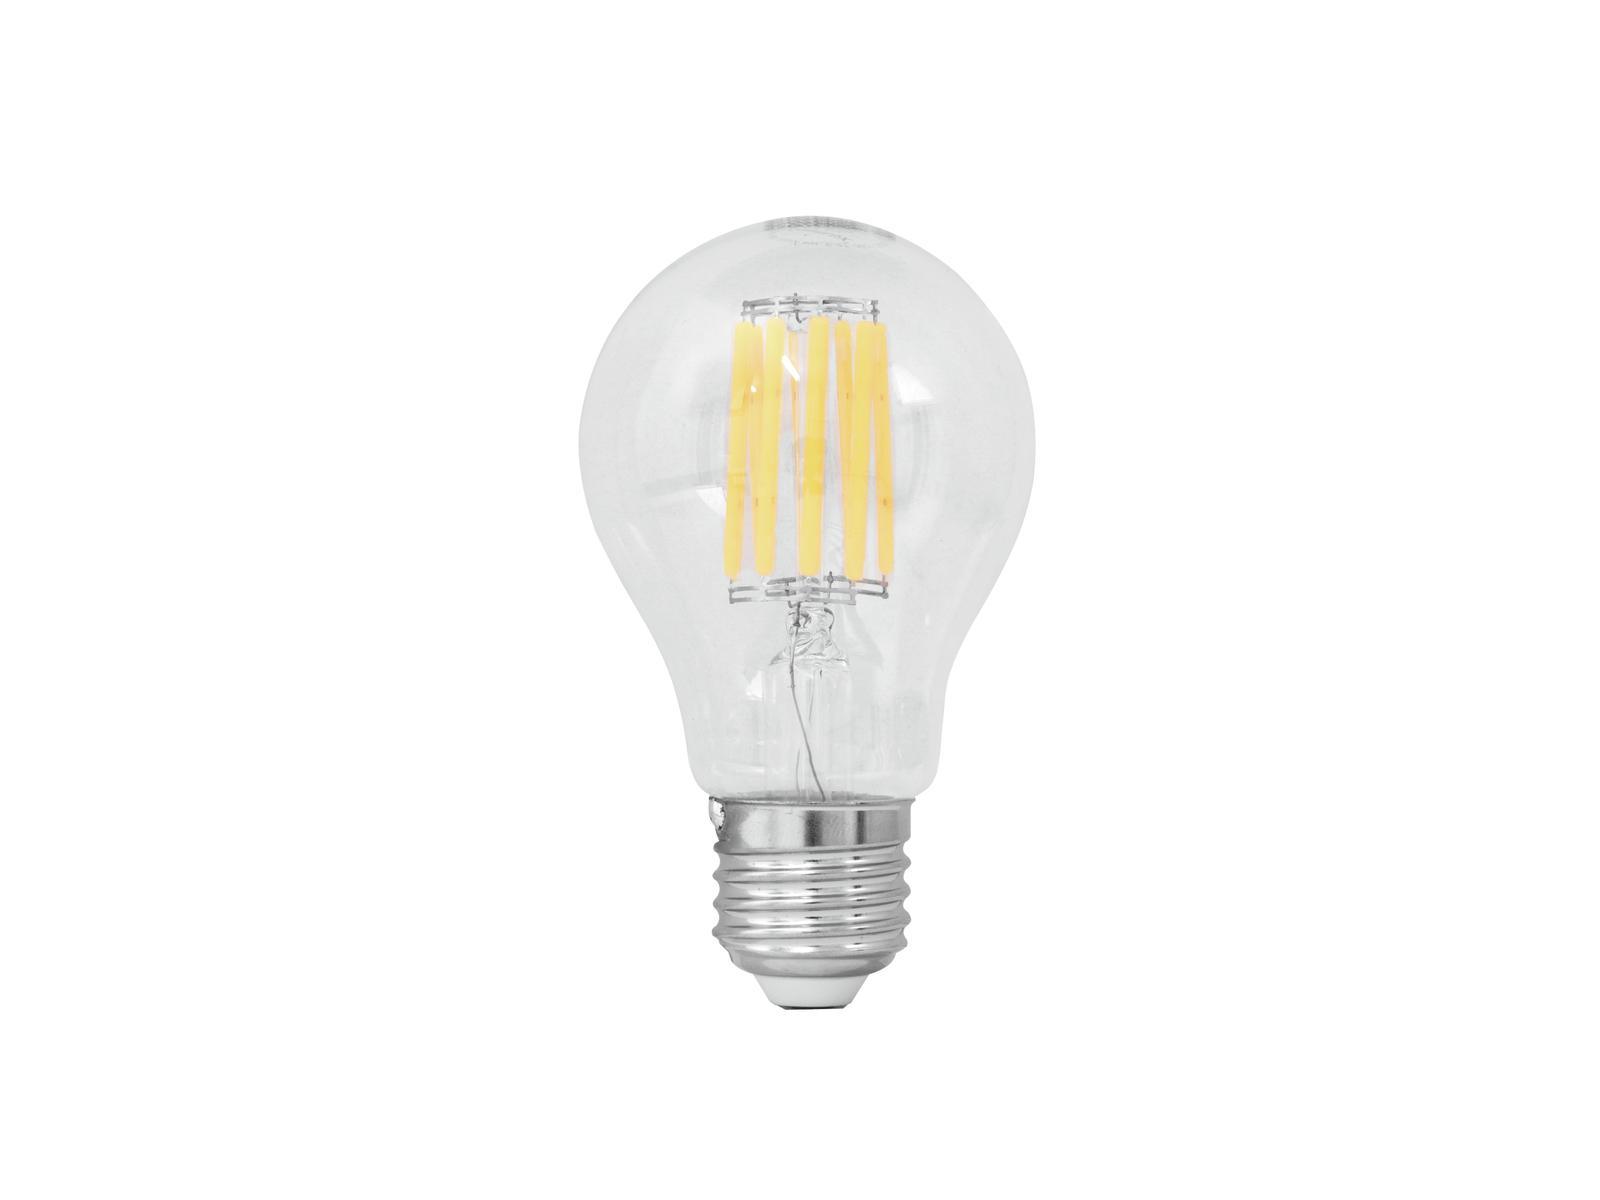 Lampada a led con filamenti 230V A60 8W E-27 3000K OMNILUX